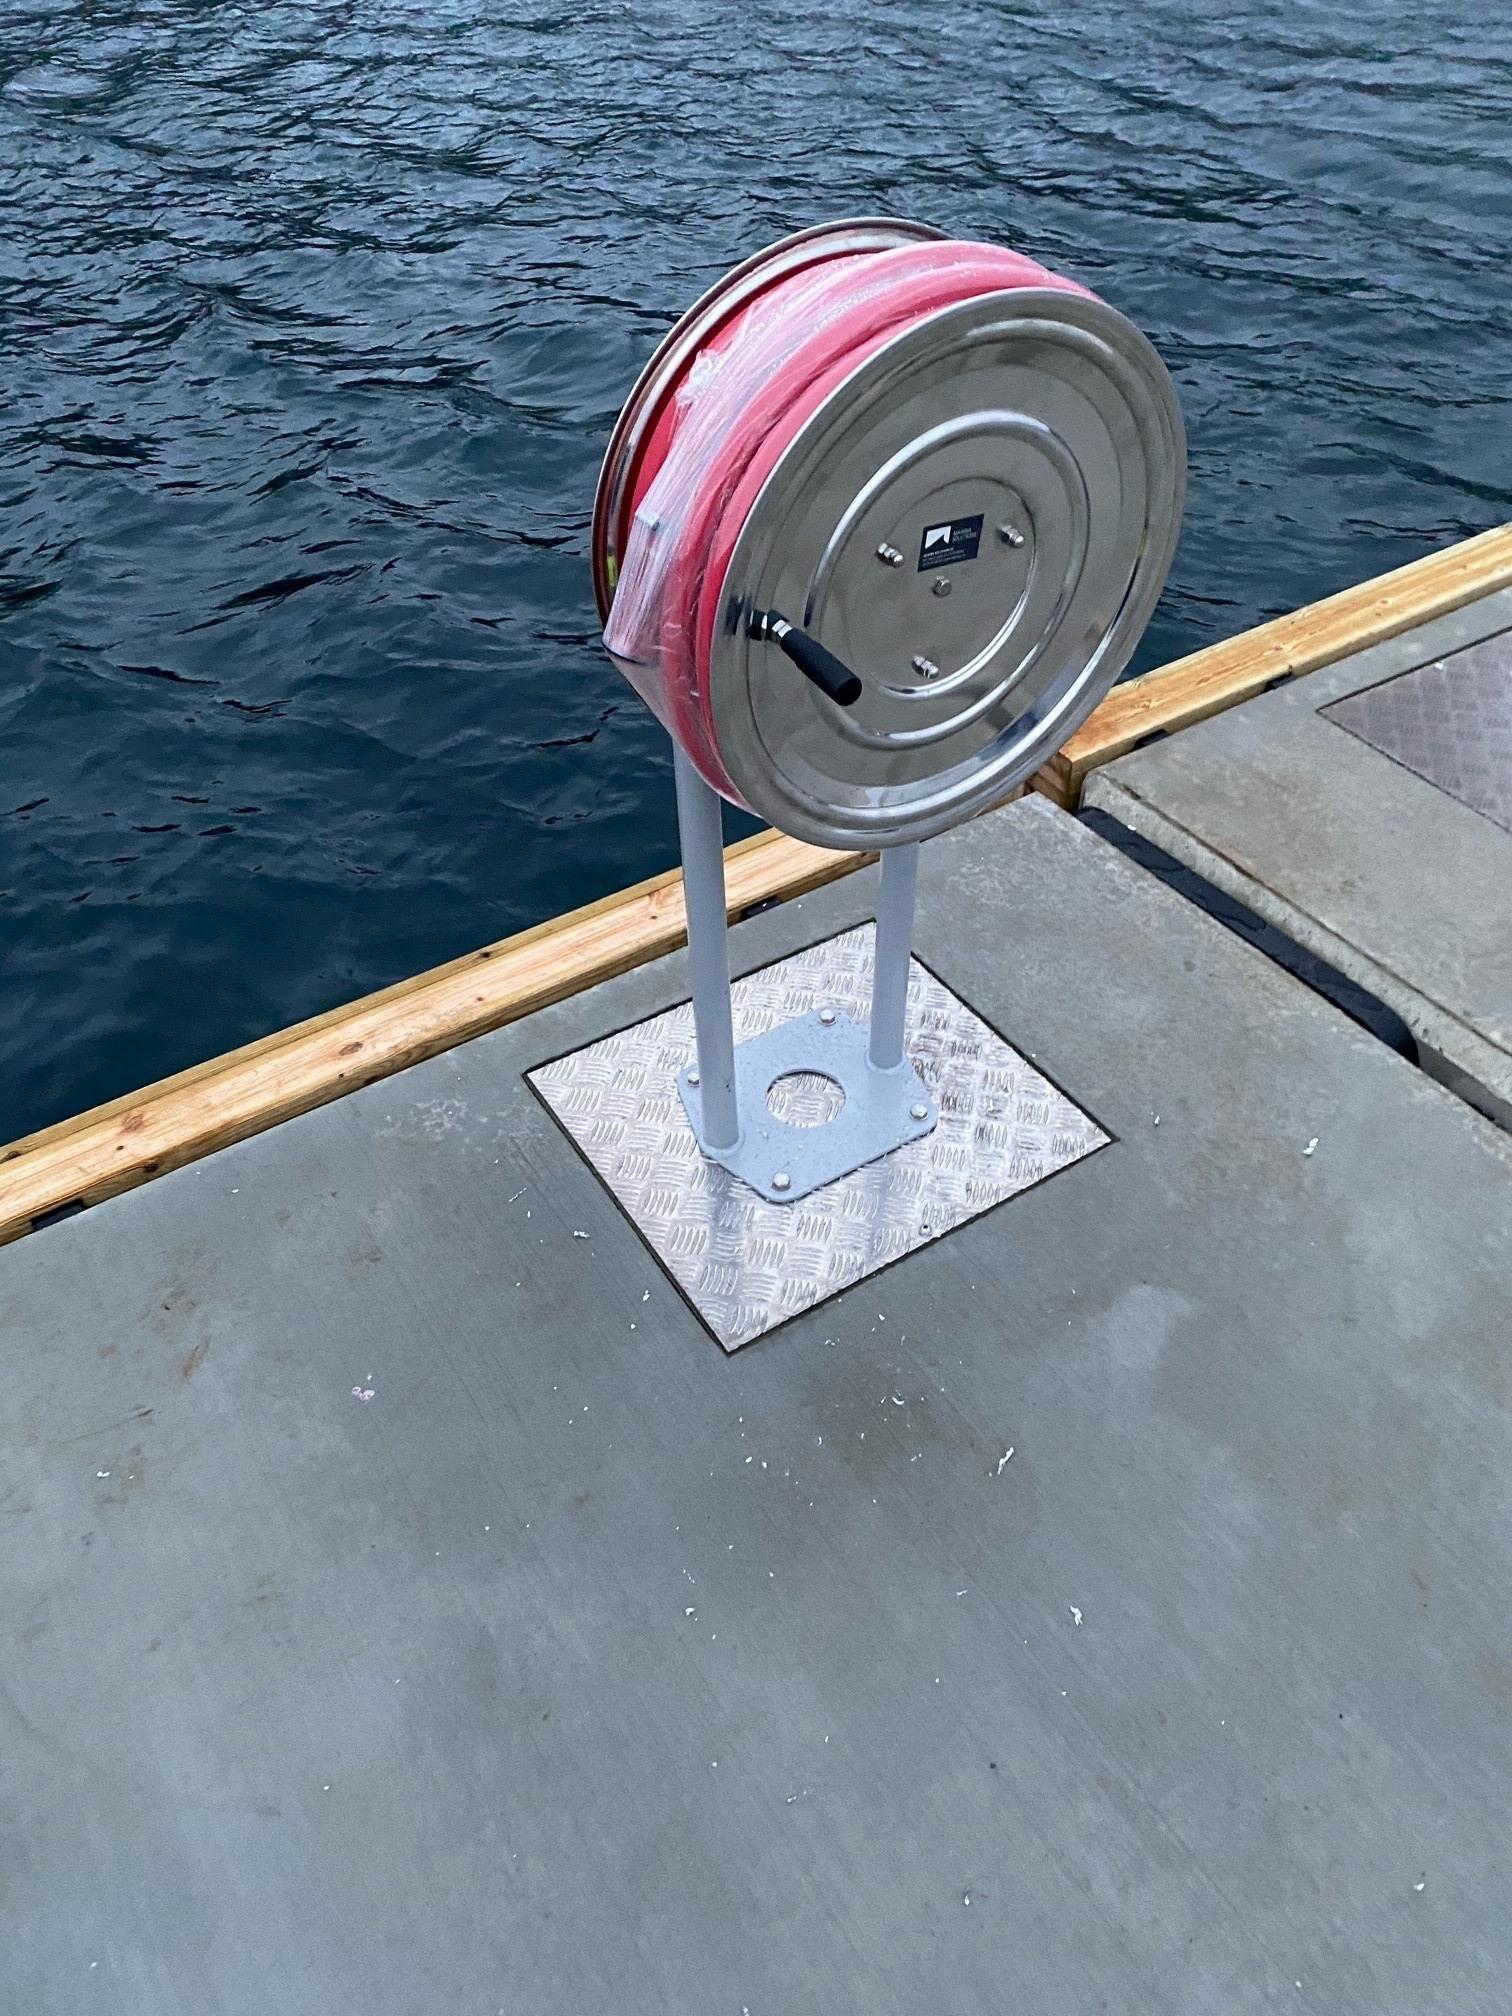 https://marinasolutions.no/uploads/Moskenesvågen-Fiskebåtlag_betongbrygger-og-utriggere-7.jpg